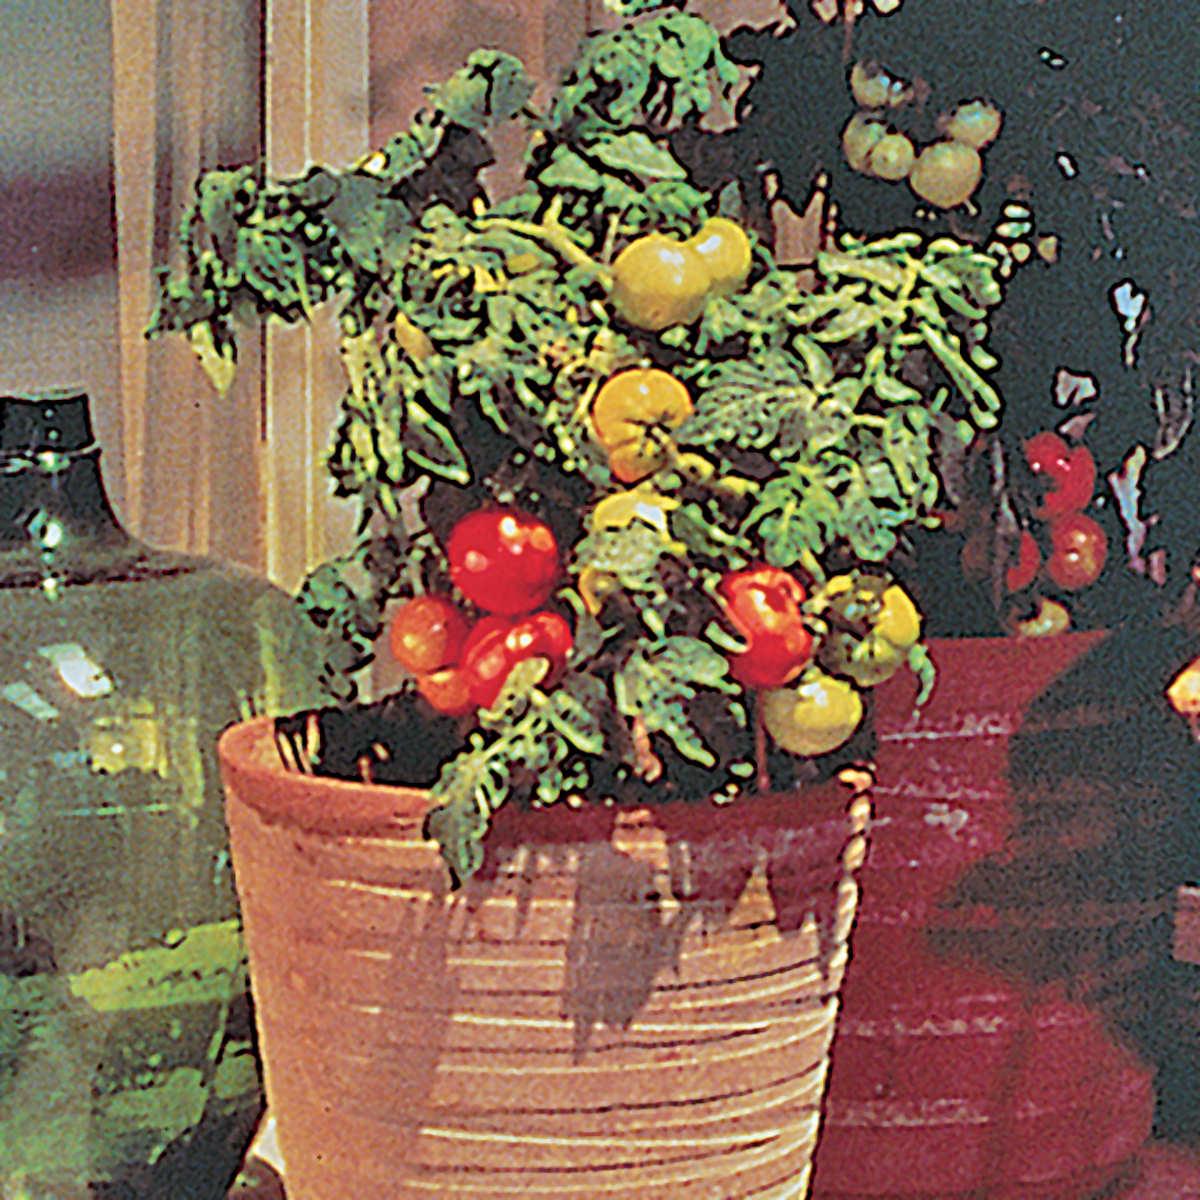 Patio F1 Hybrid Tomato Seeds